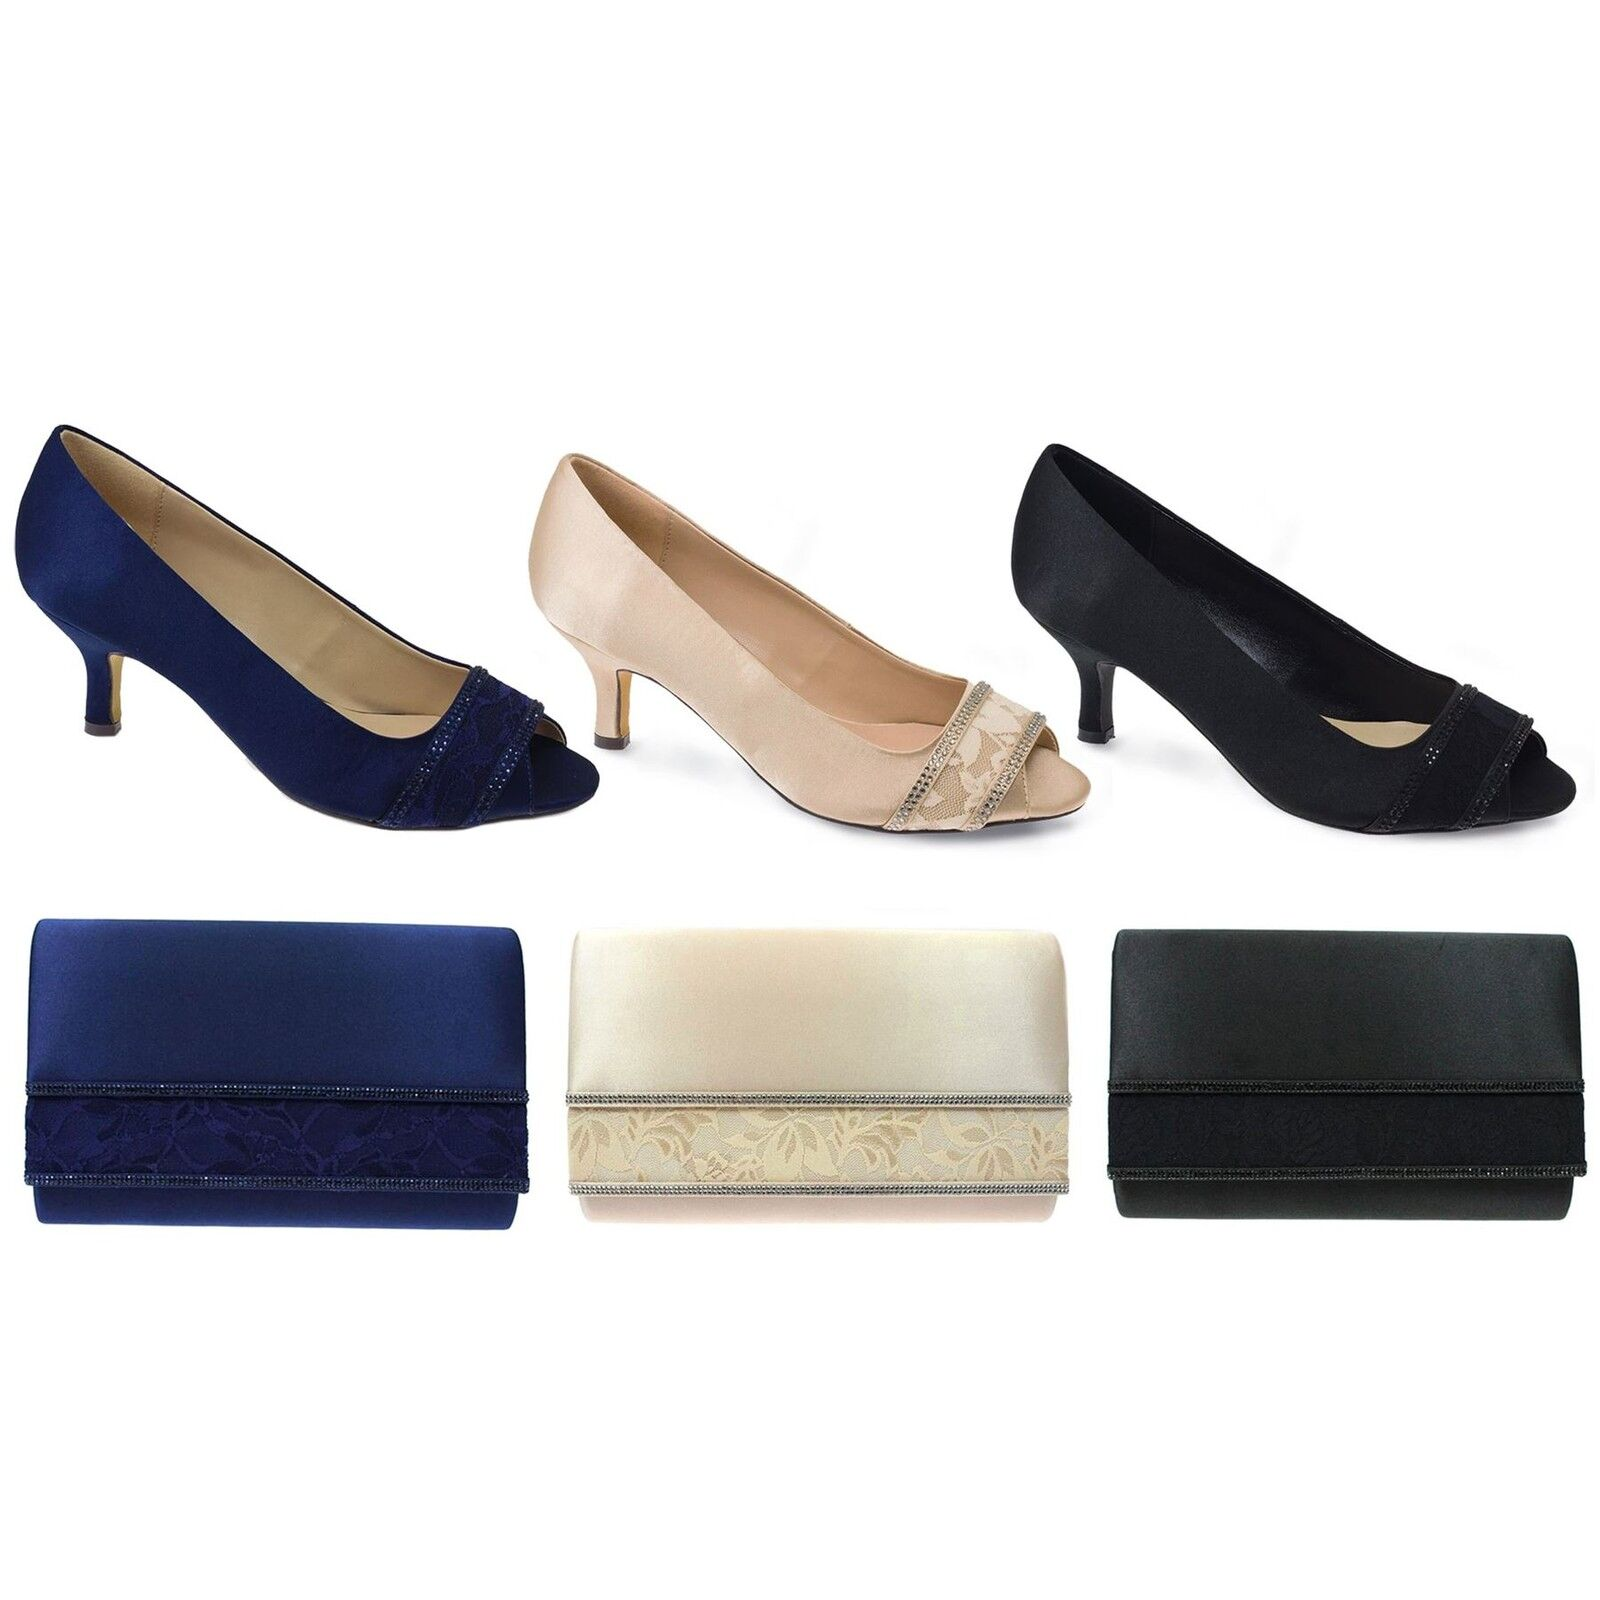 FLR419 Casely Damens's Peep Toe Smart Diamante Lace Court Heels Schuhes Clutch